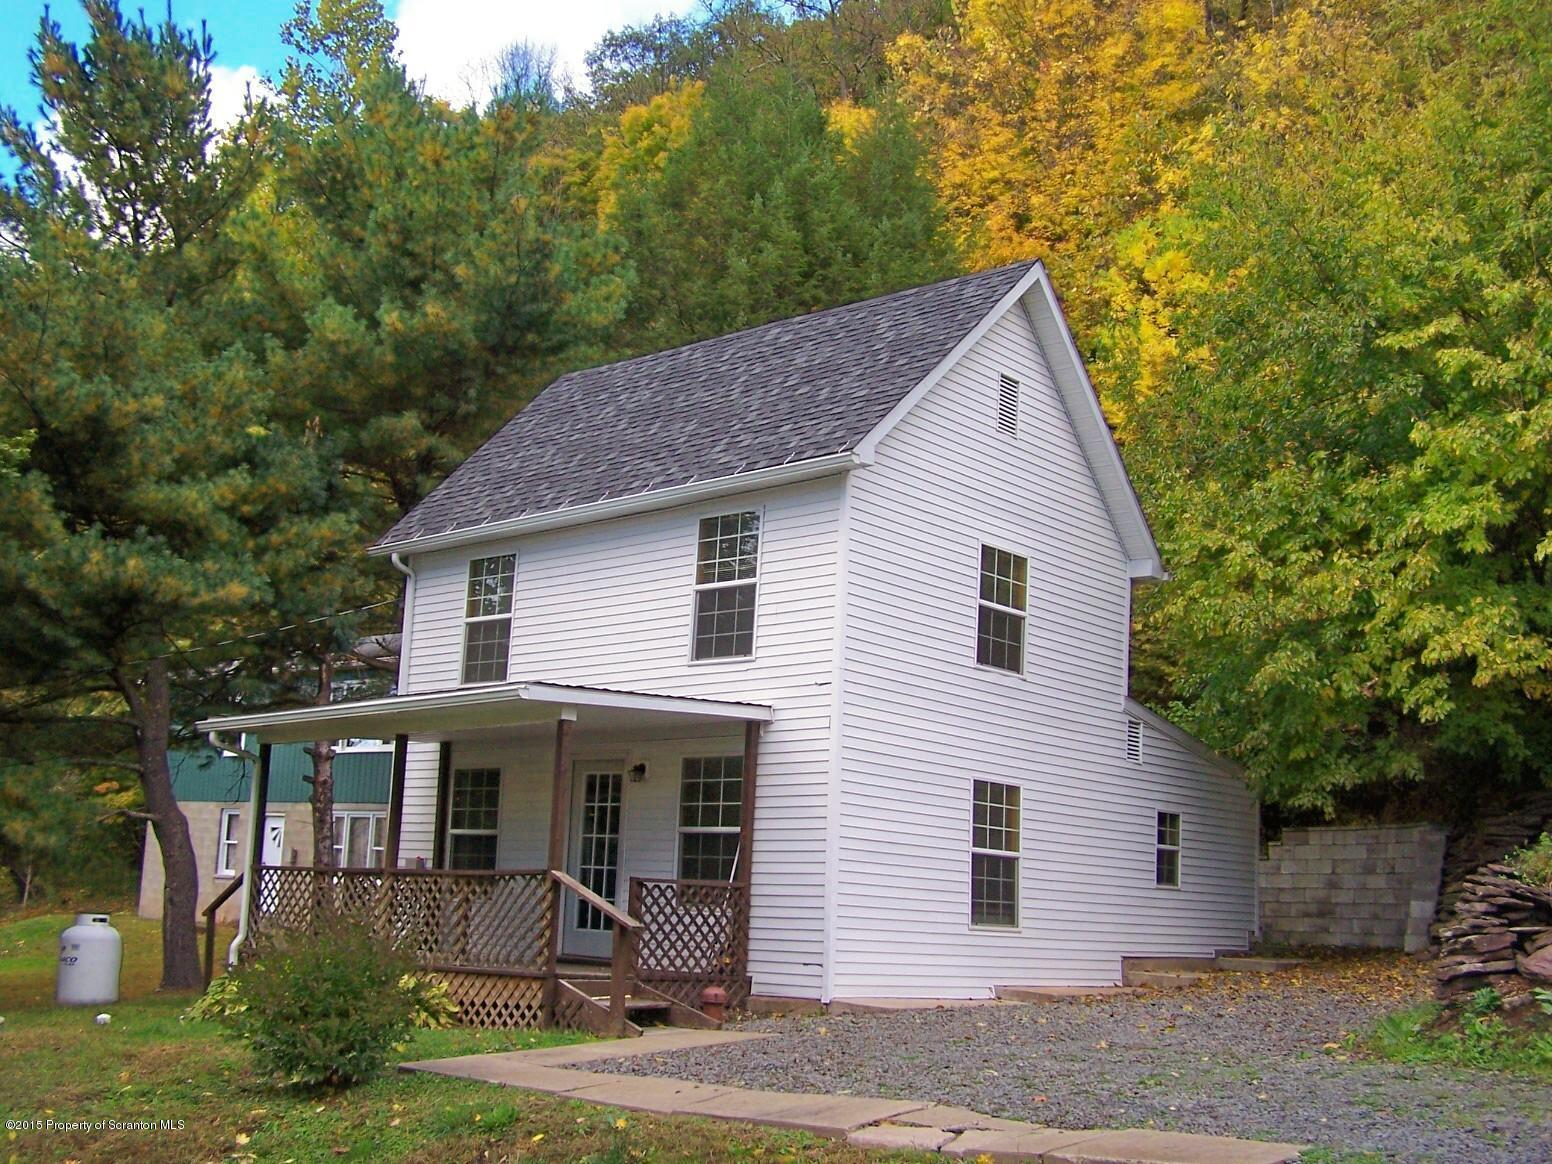 244 Dug Rd, Mehoopany, Pennsylvania 18629